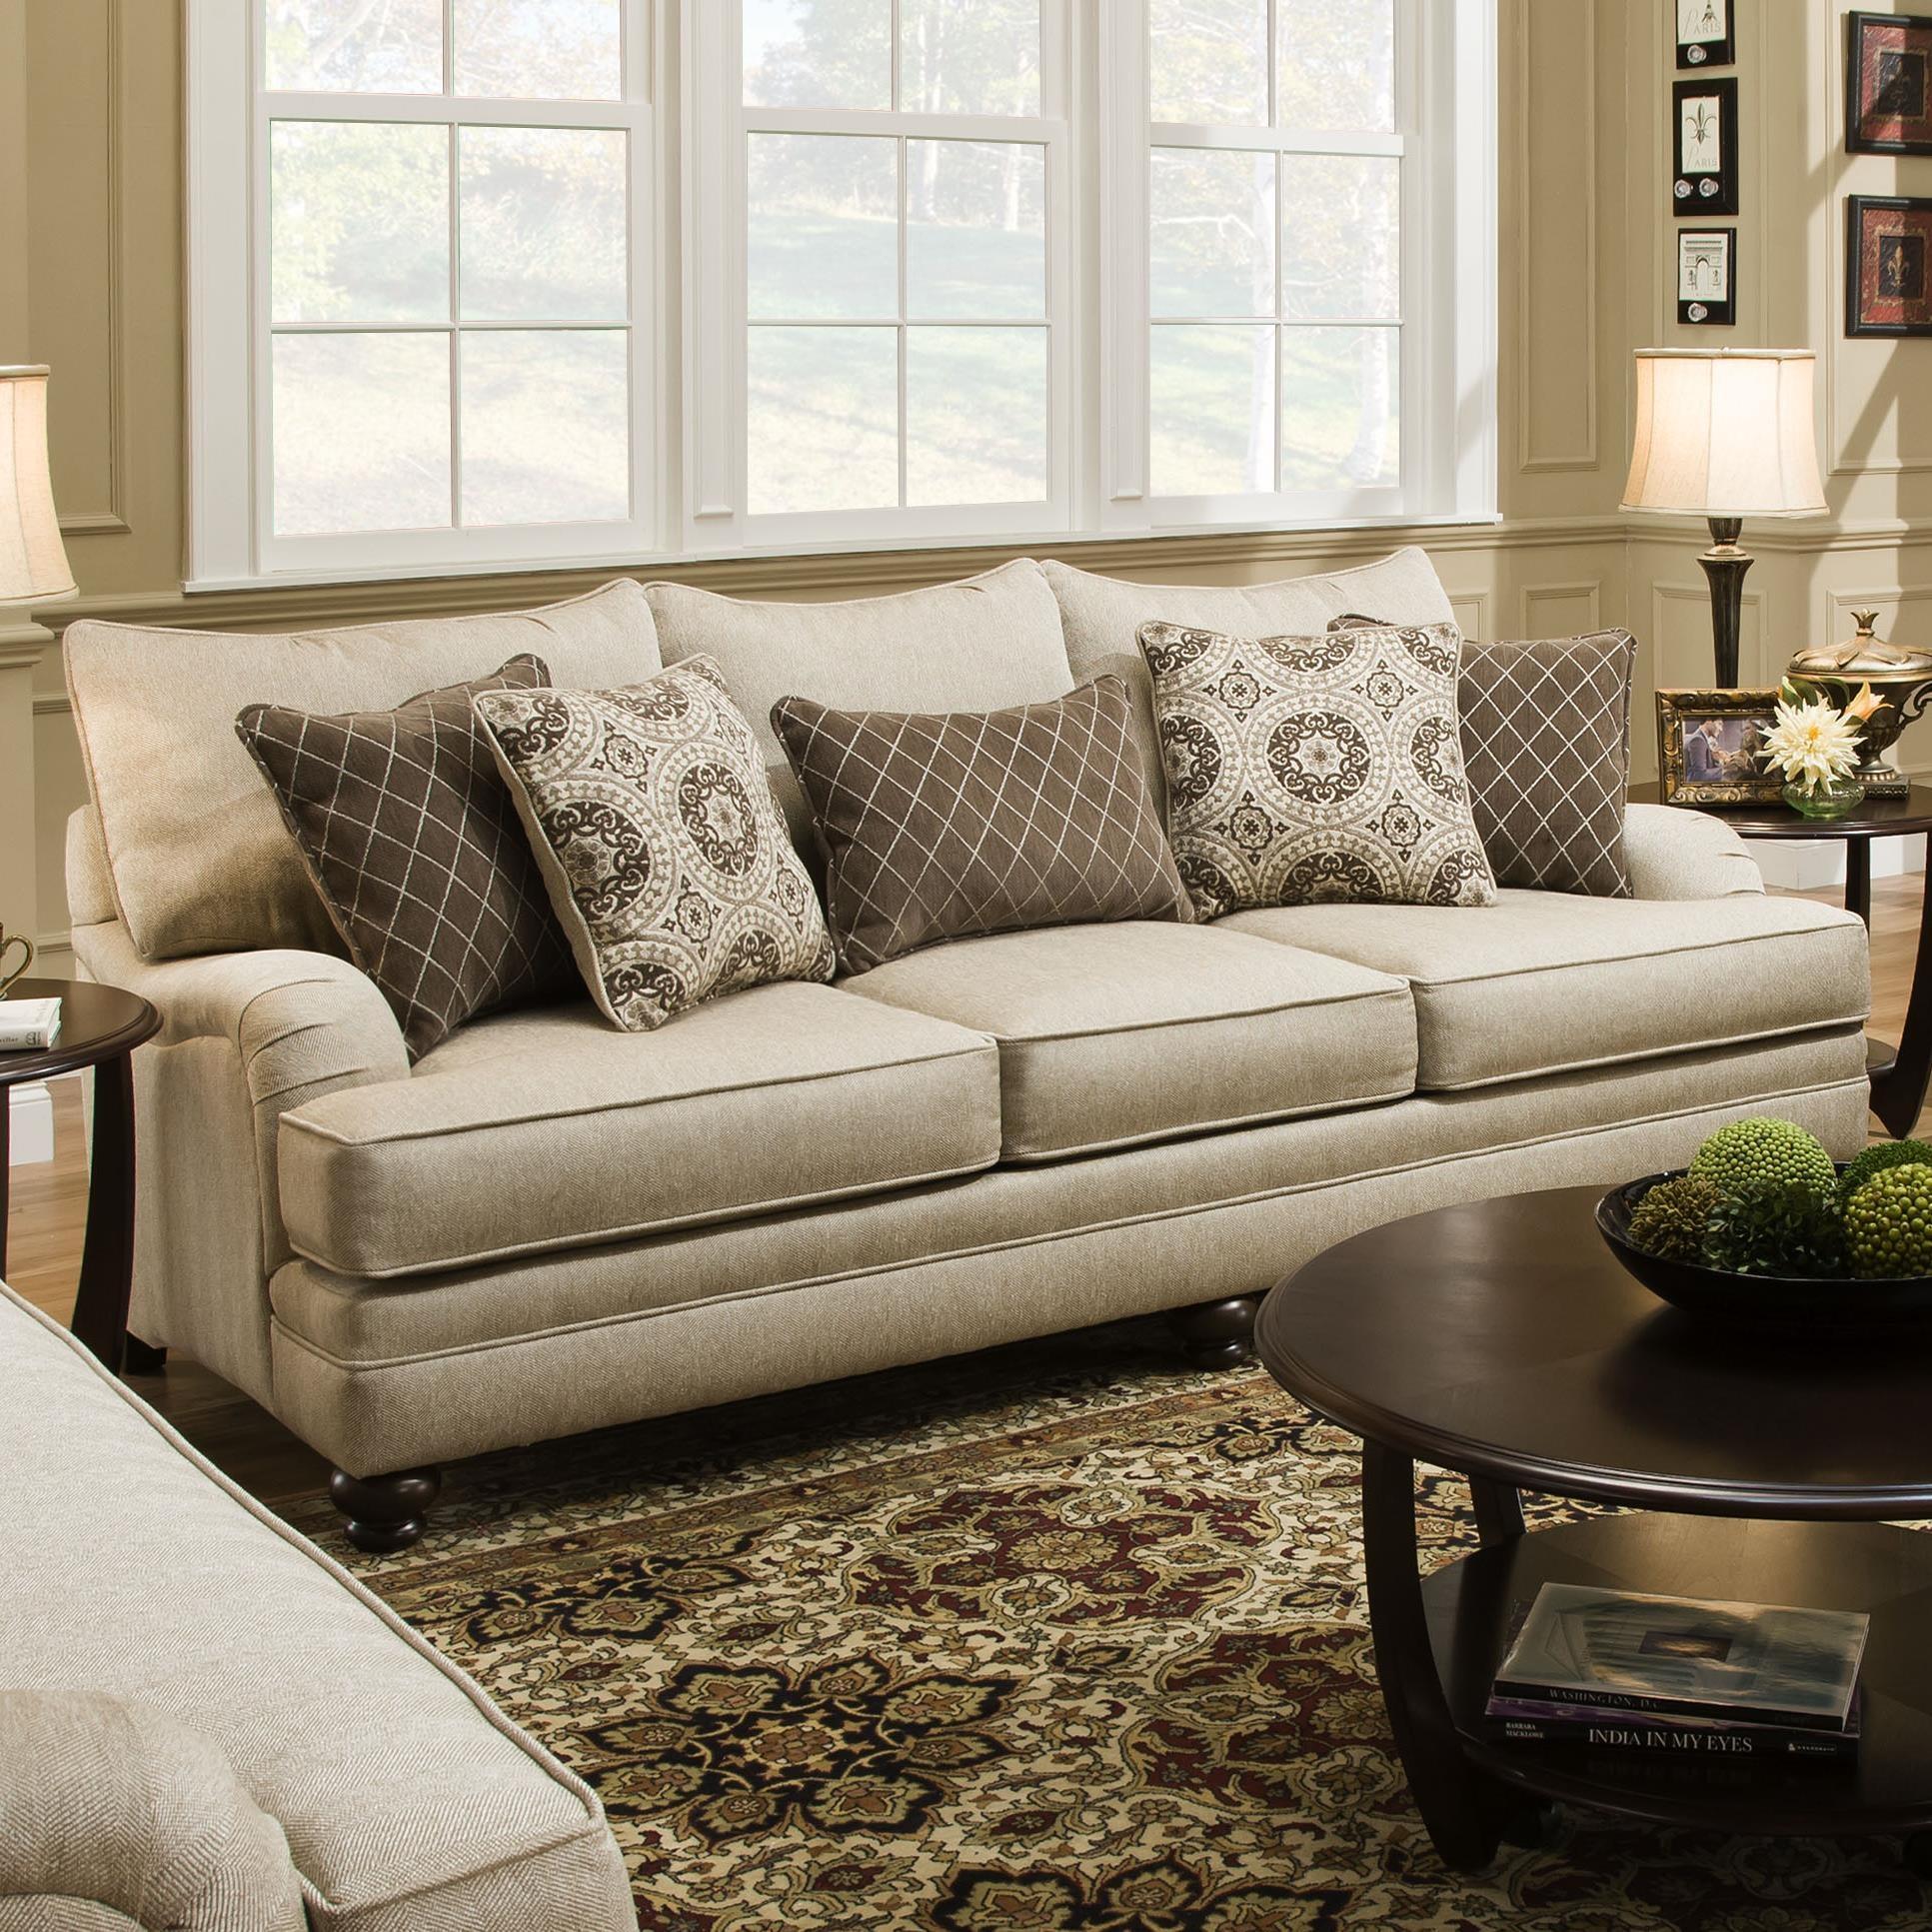 AFD Furniture OVER SIZED SOFA UPCRCOAC190A